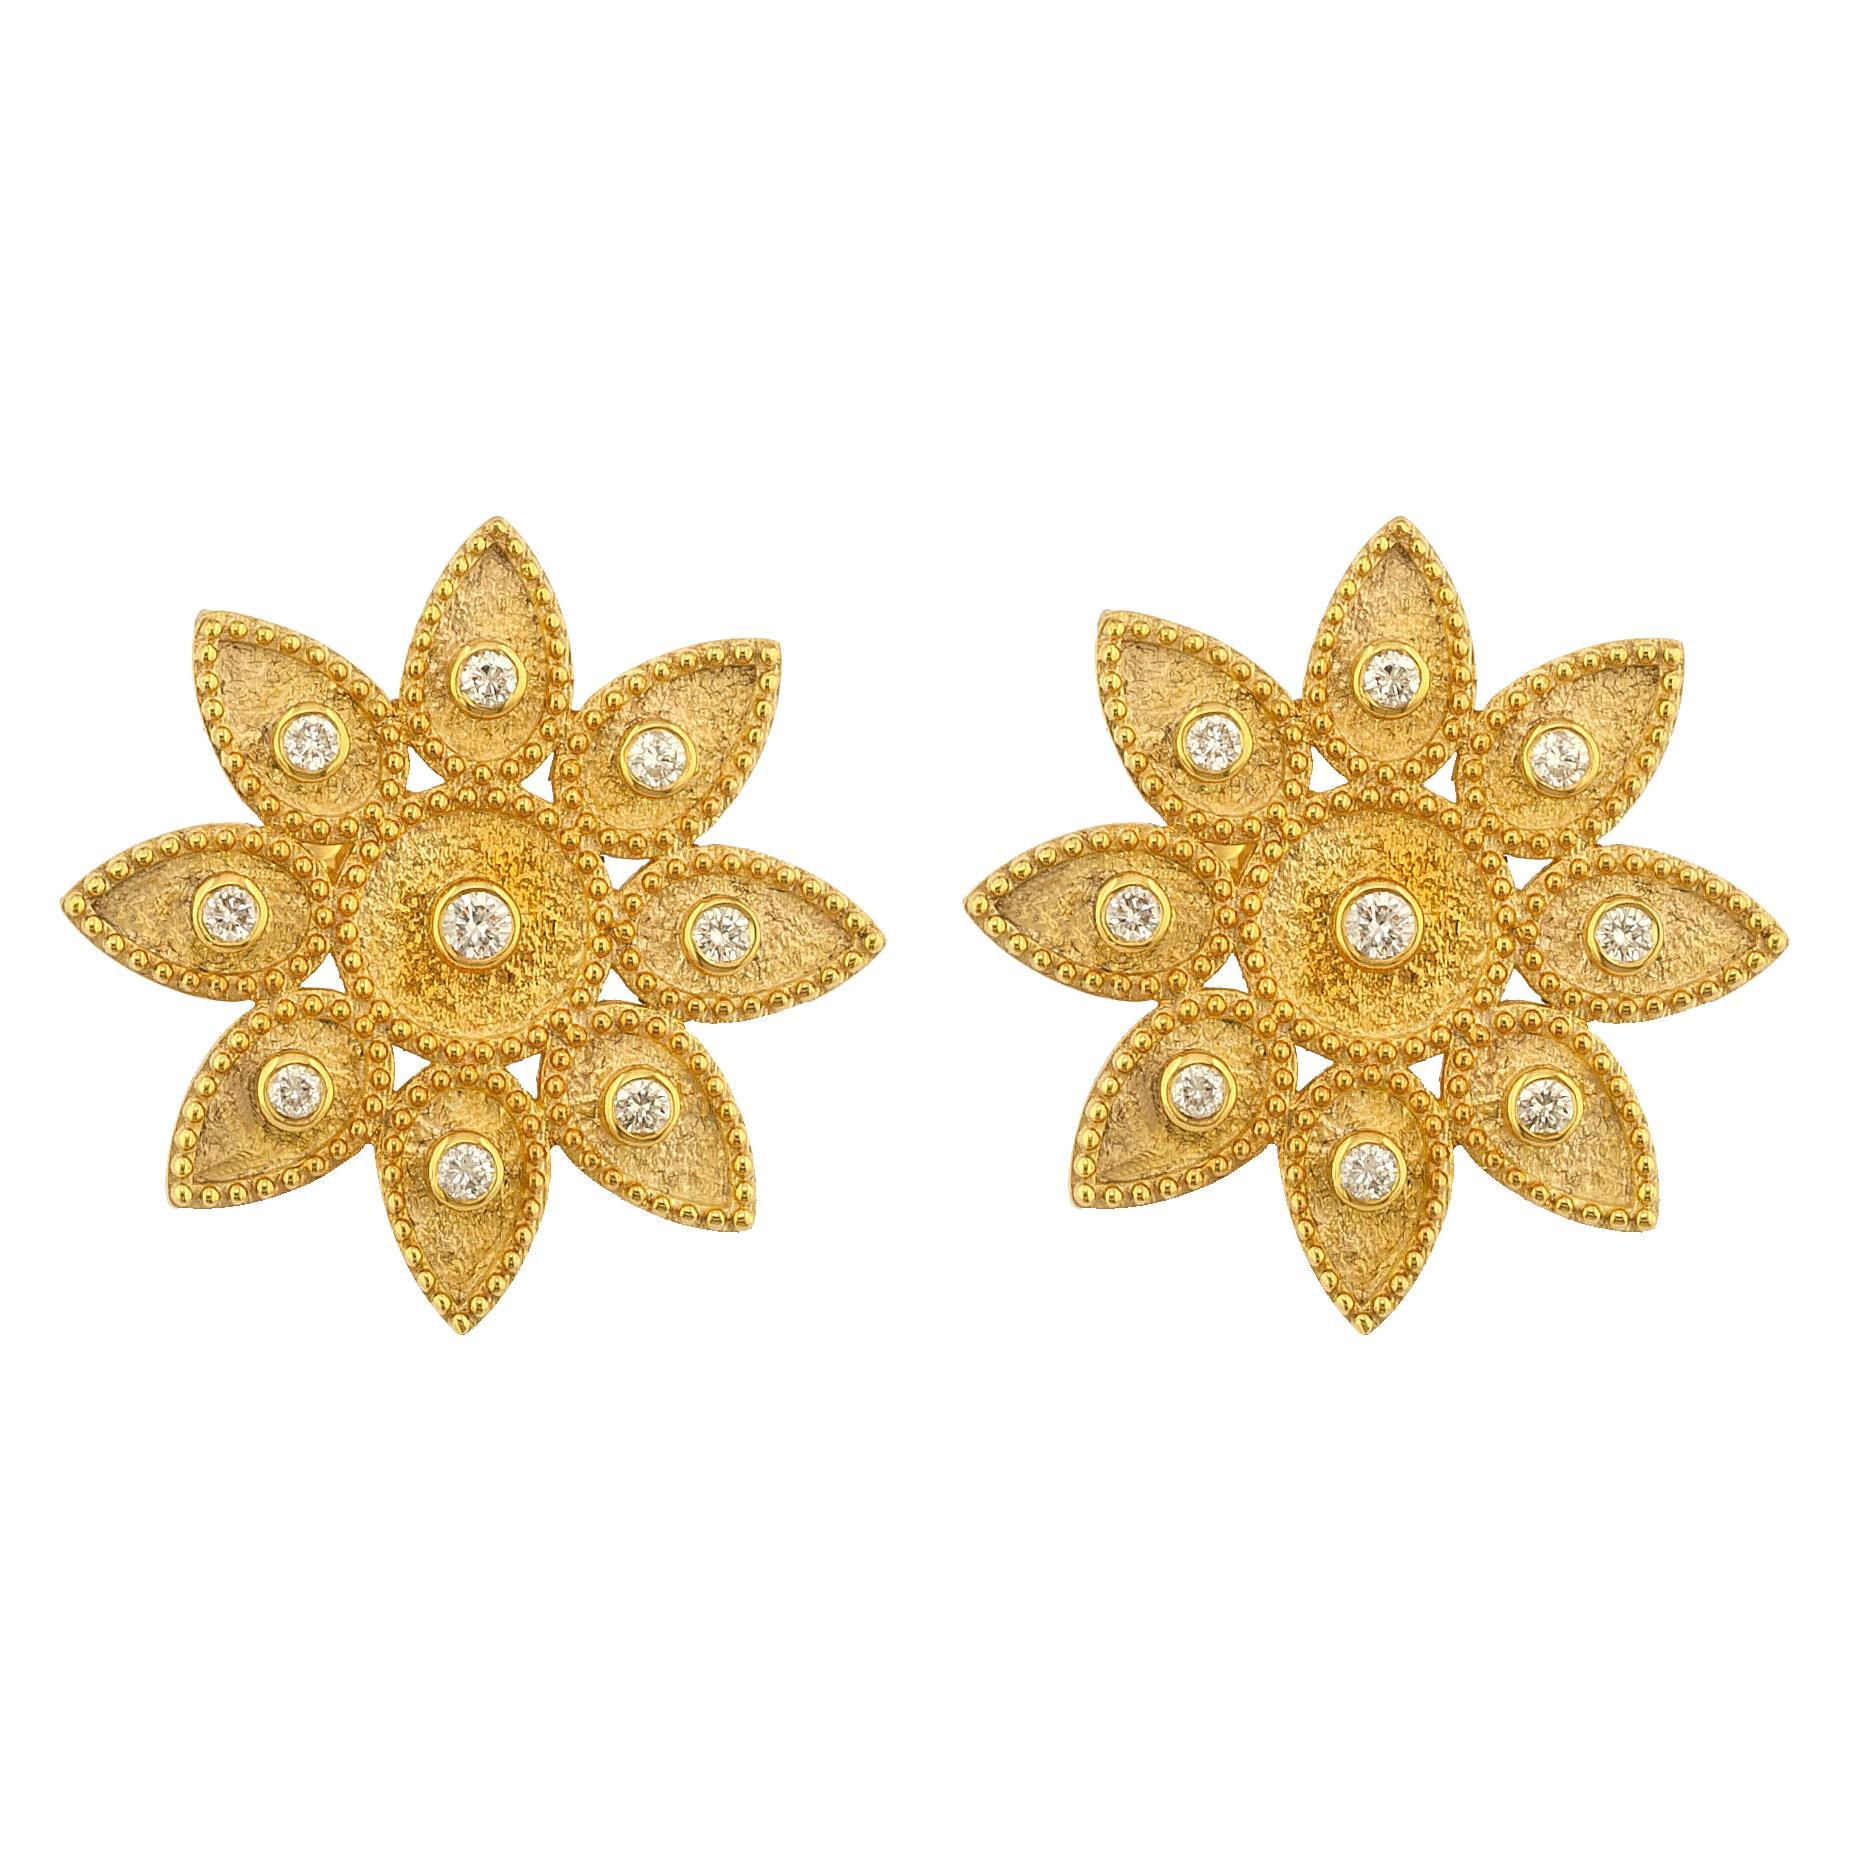 Georgios Collections 18 Karat Yellow Gold Diamond Sunburst Stud Round Earrings